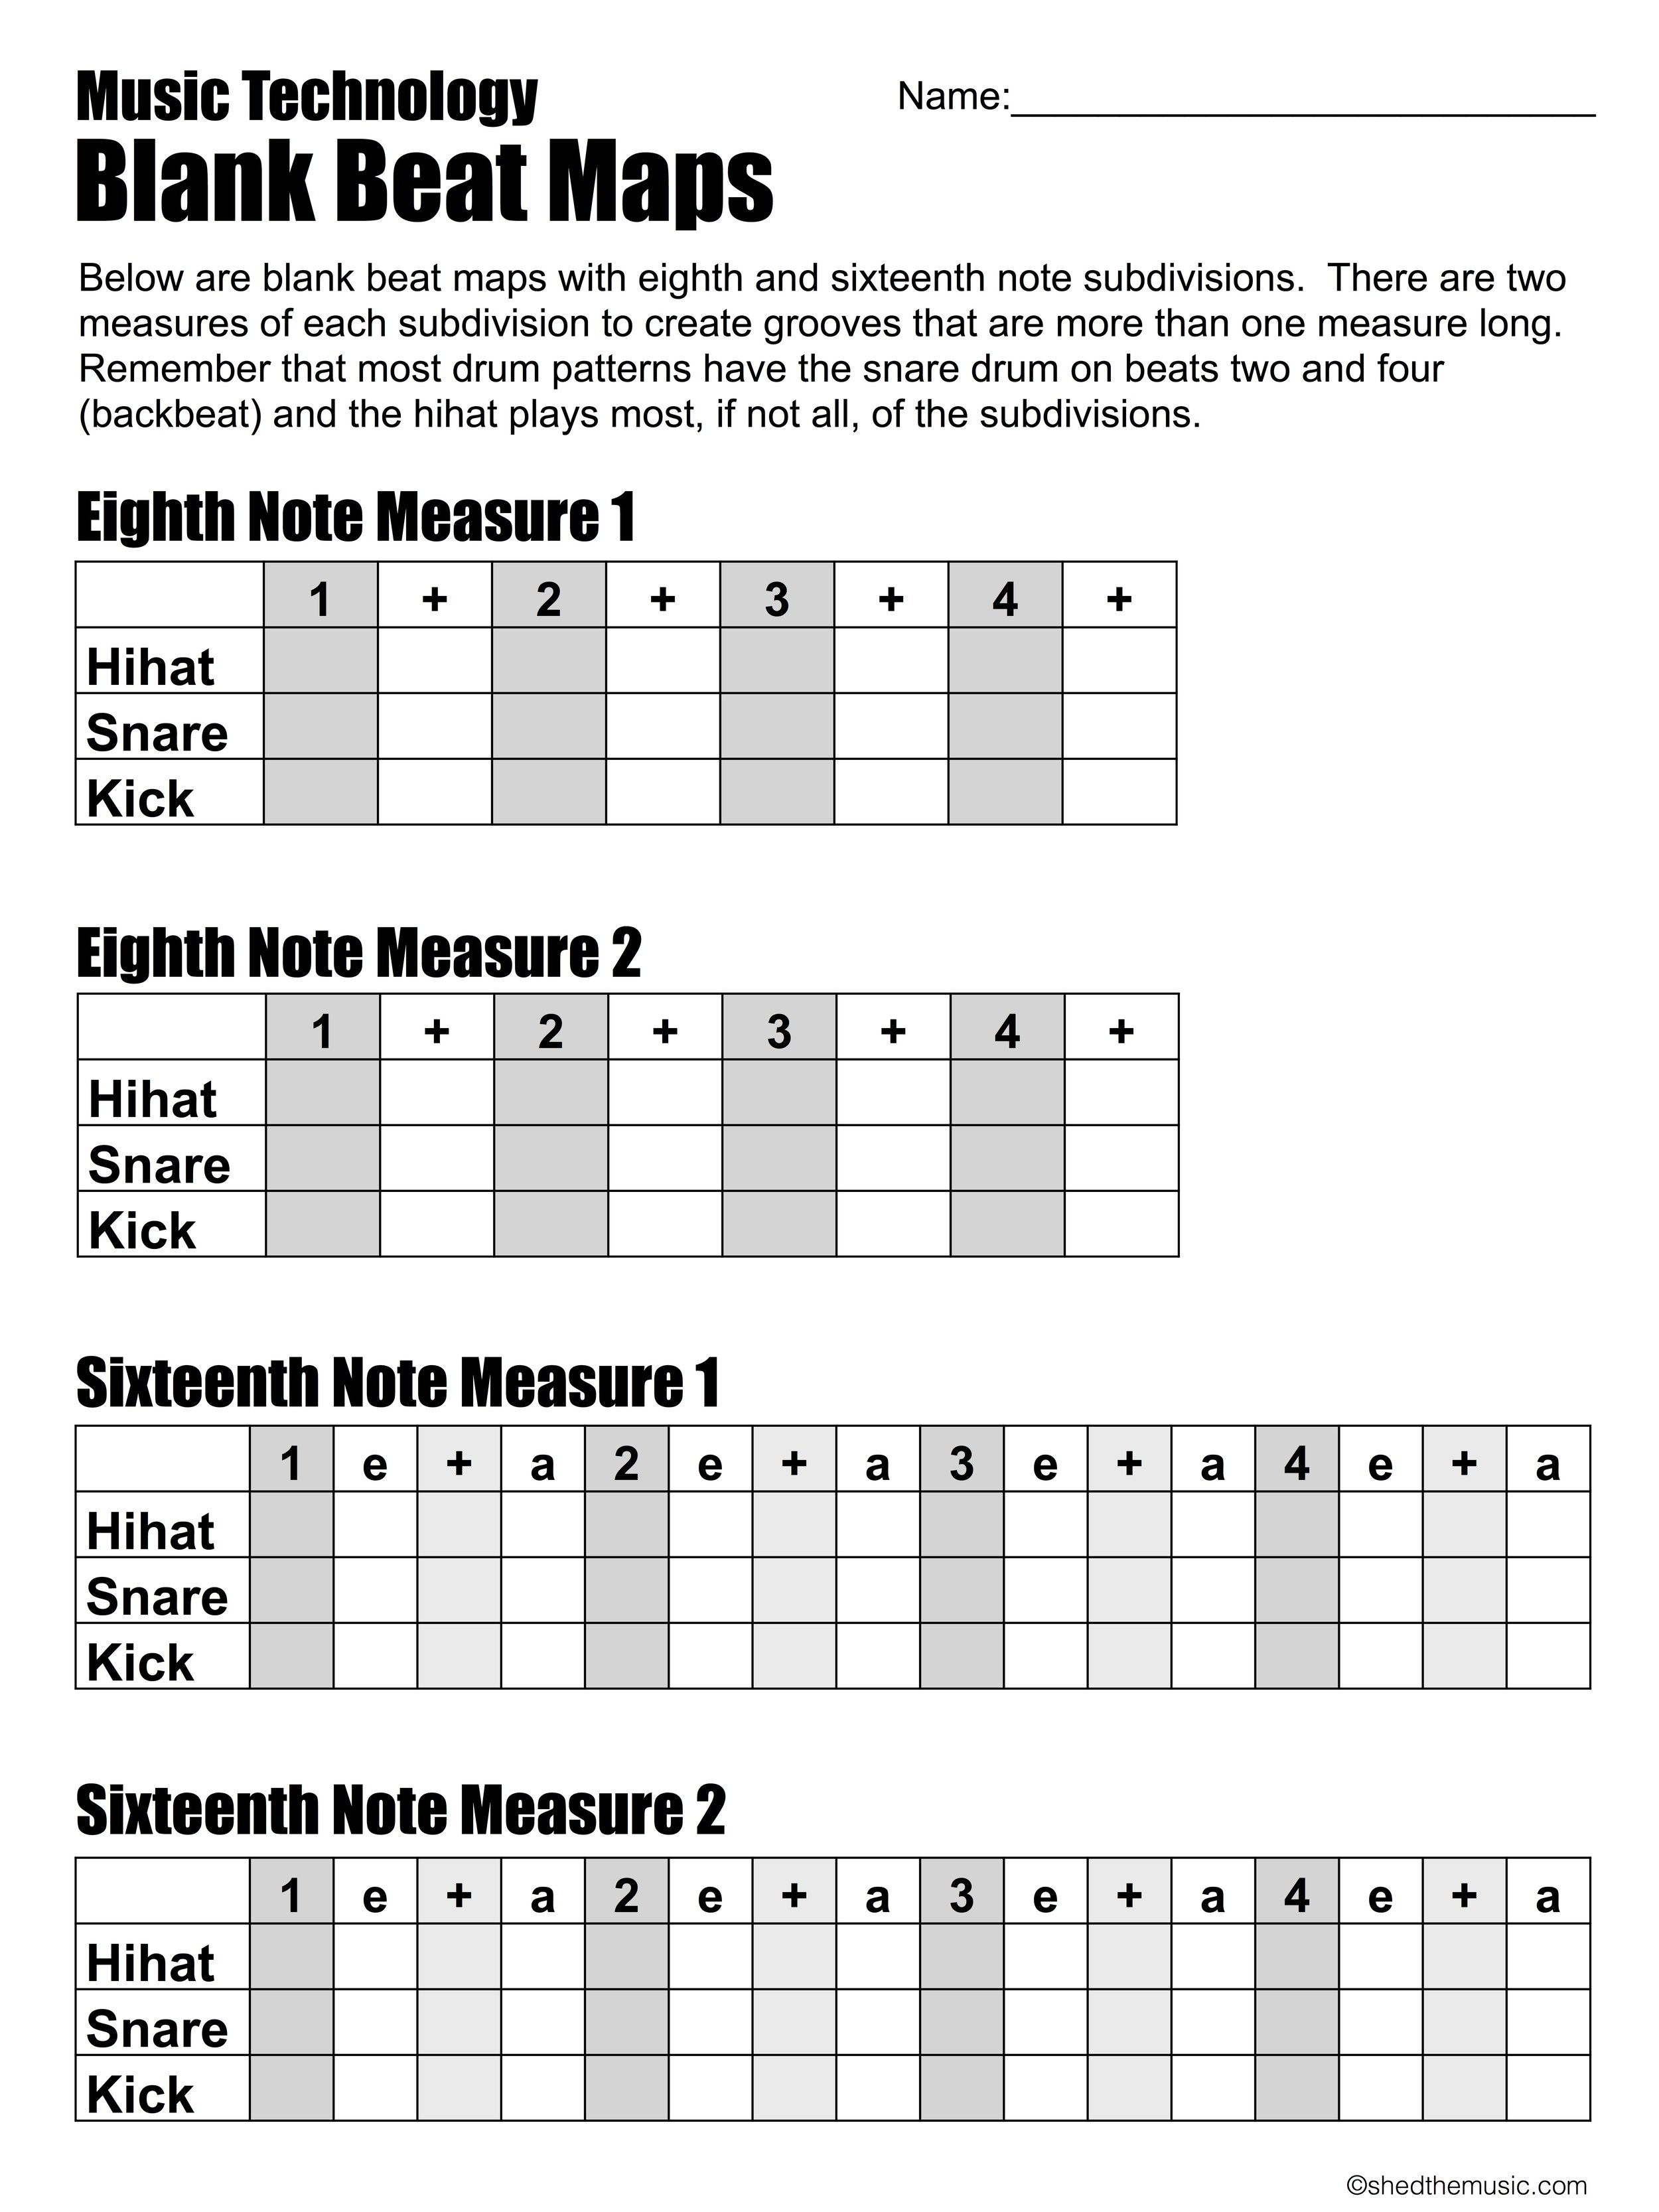 Blank beat Map worksheet.jpg